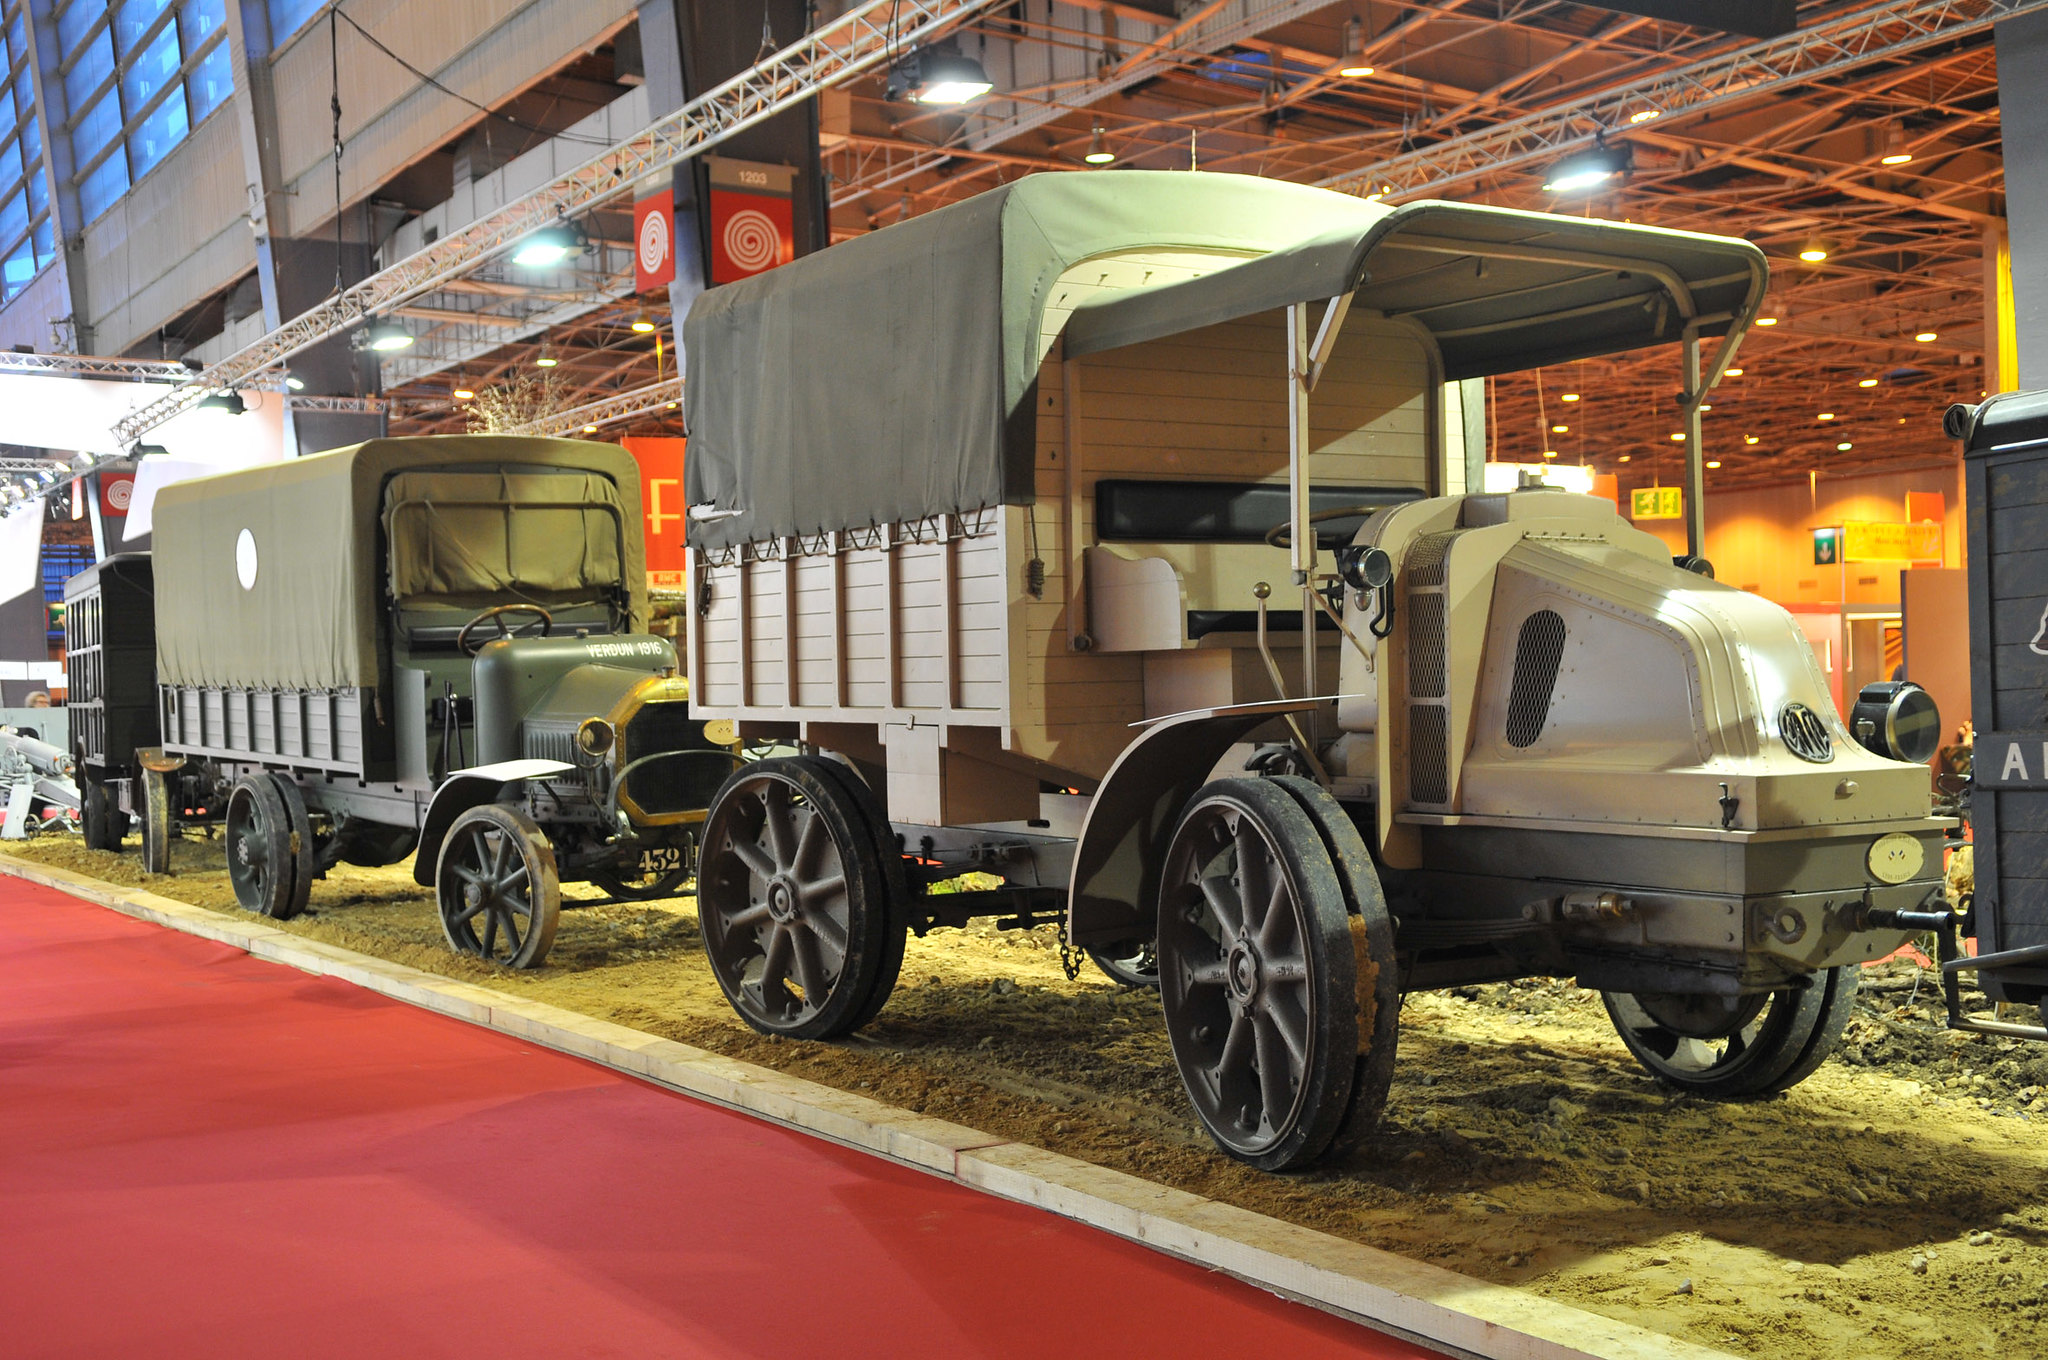 Tracteur d'artillerie Latil 4x4